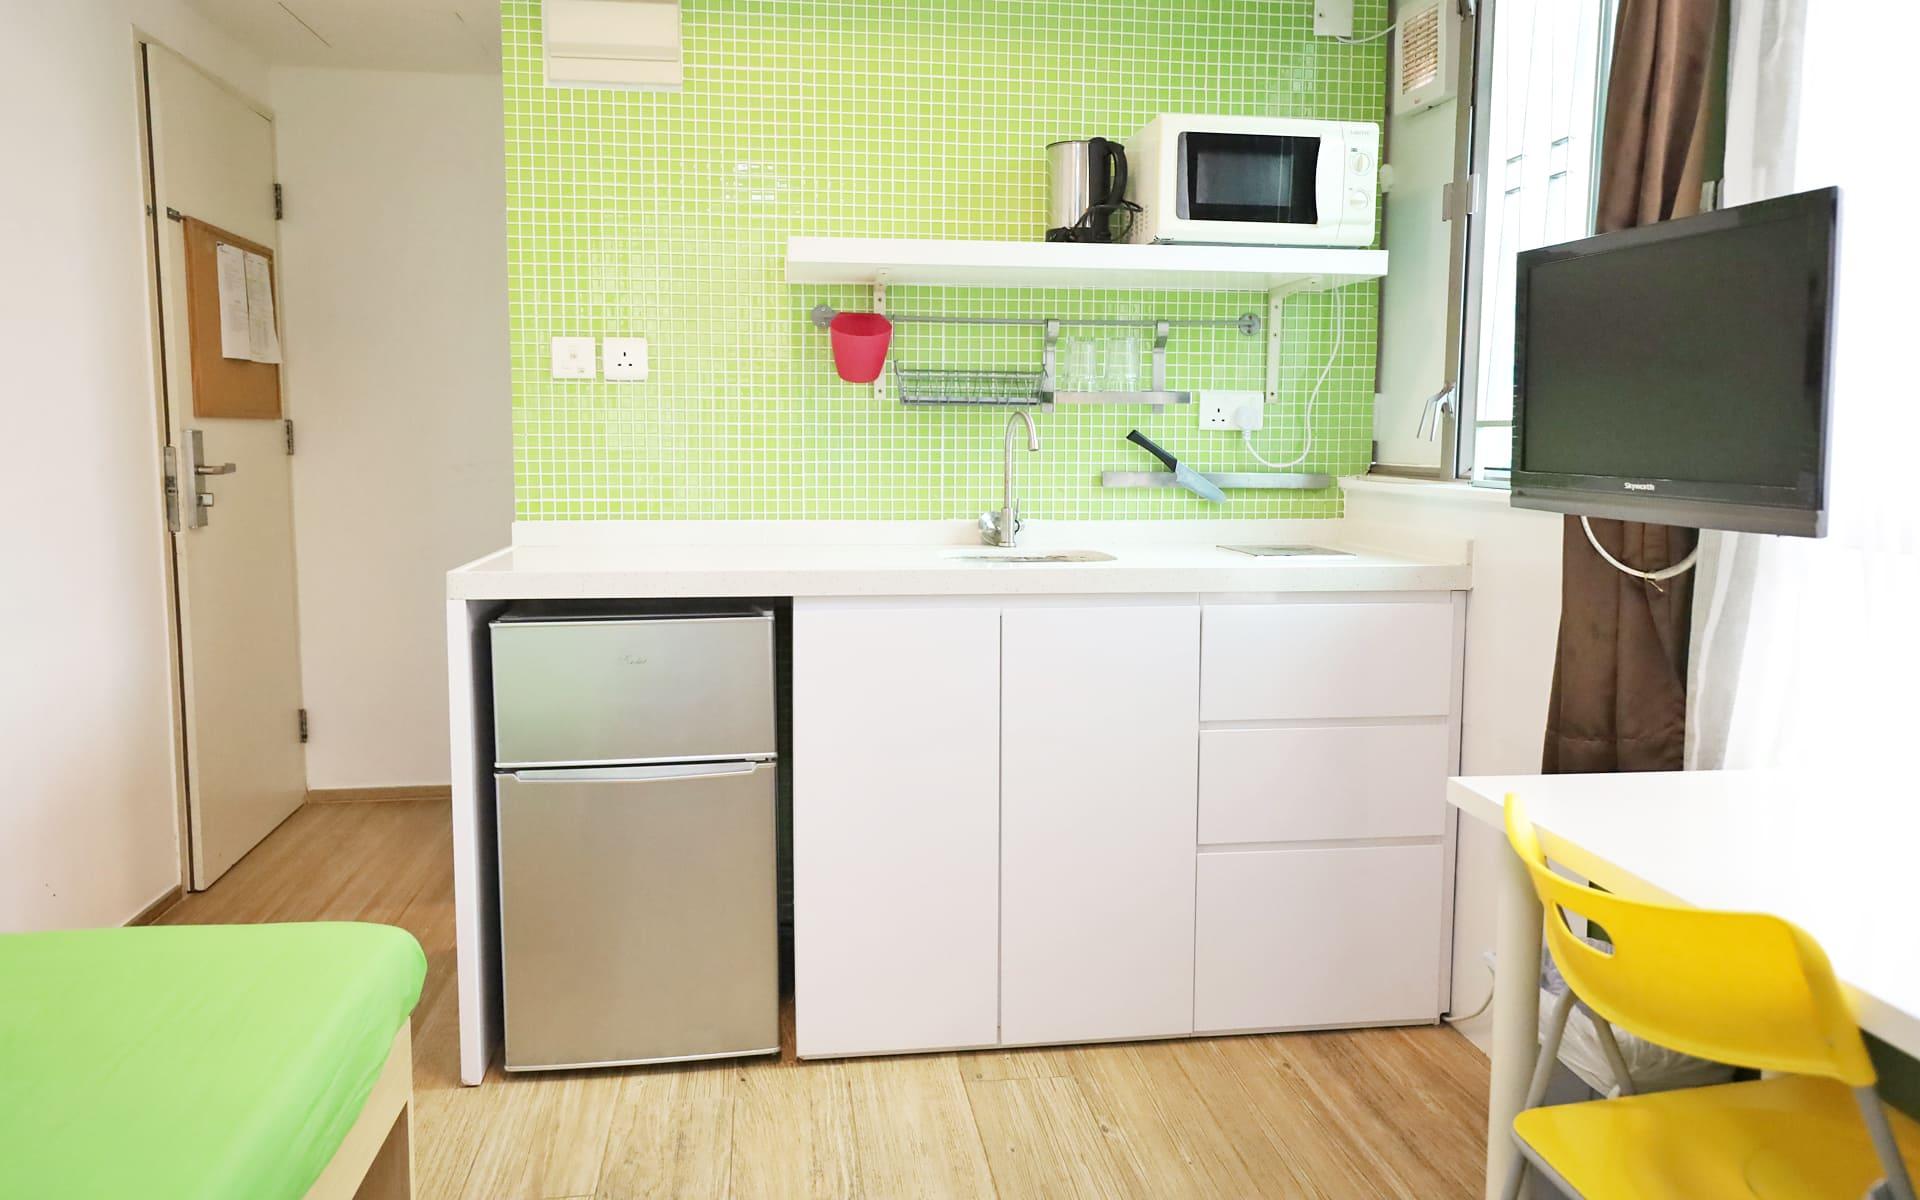 hk_service_apartment_15441673241580801987.jpg